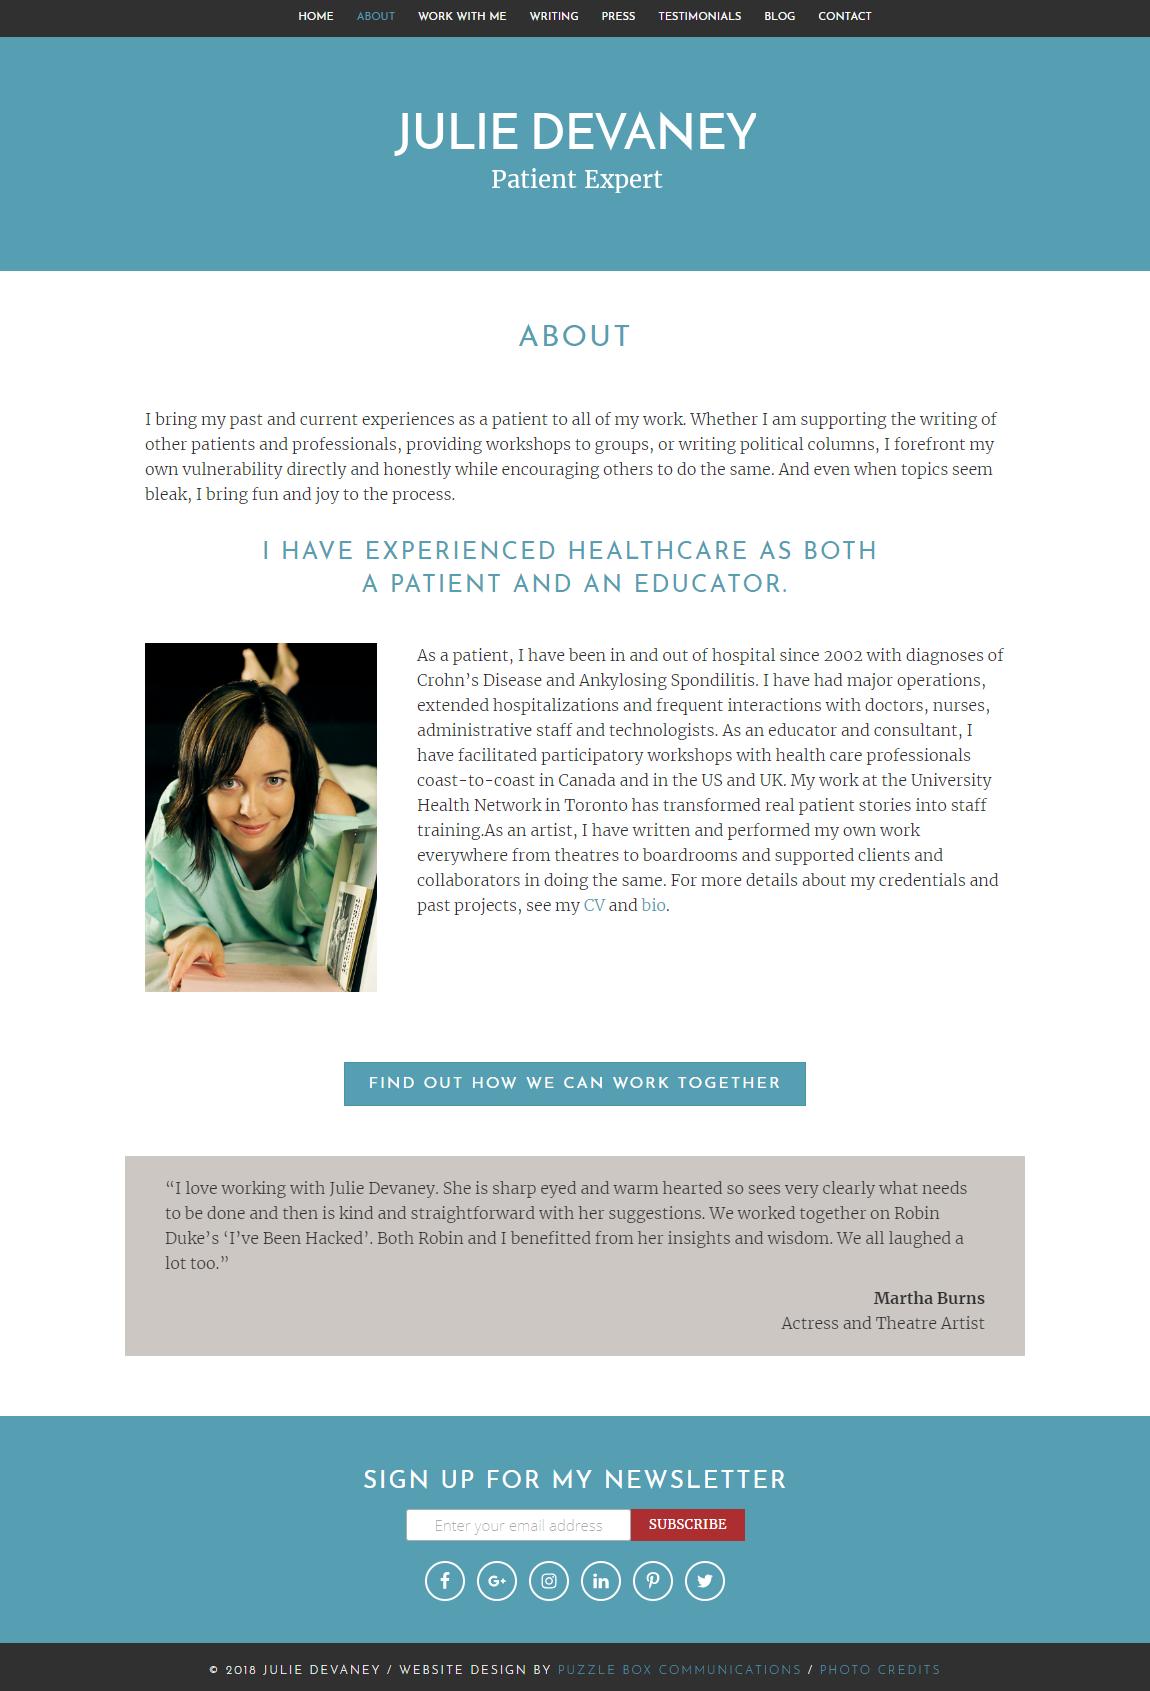 juliedevaney.com, custom wordpress web design and development